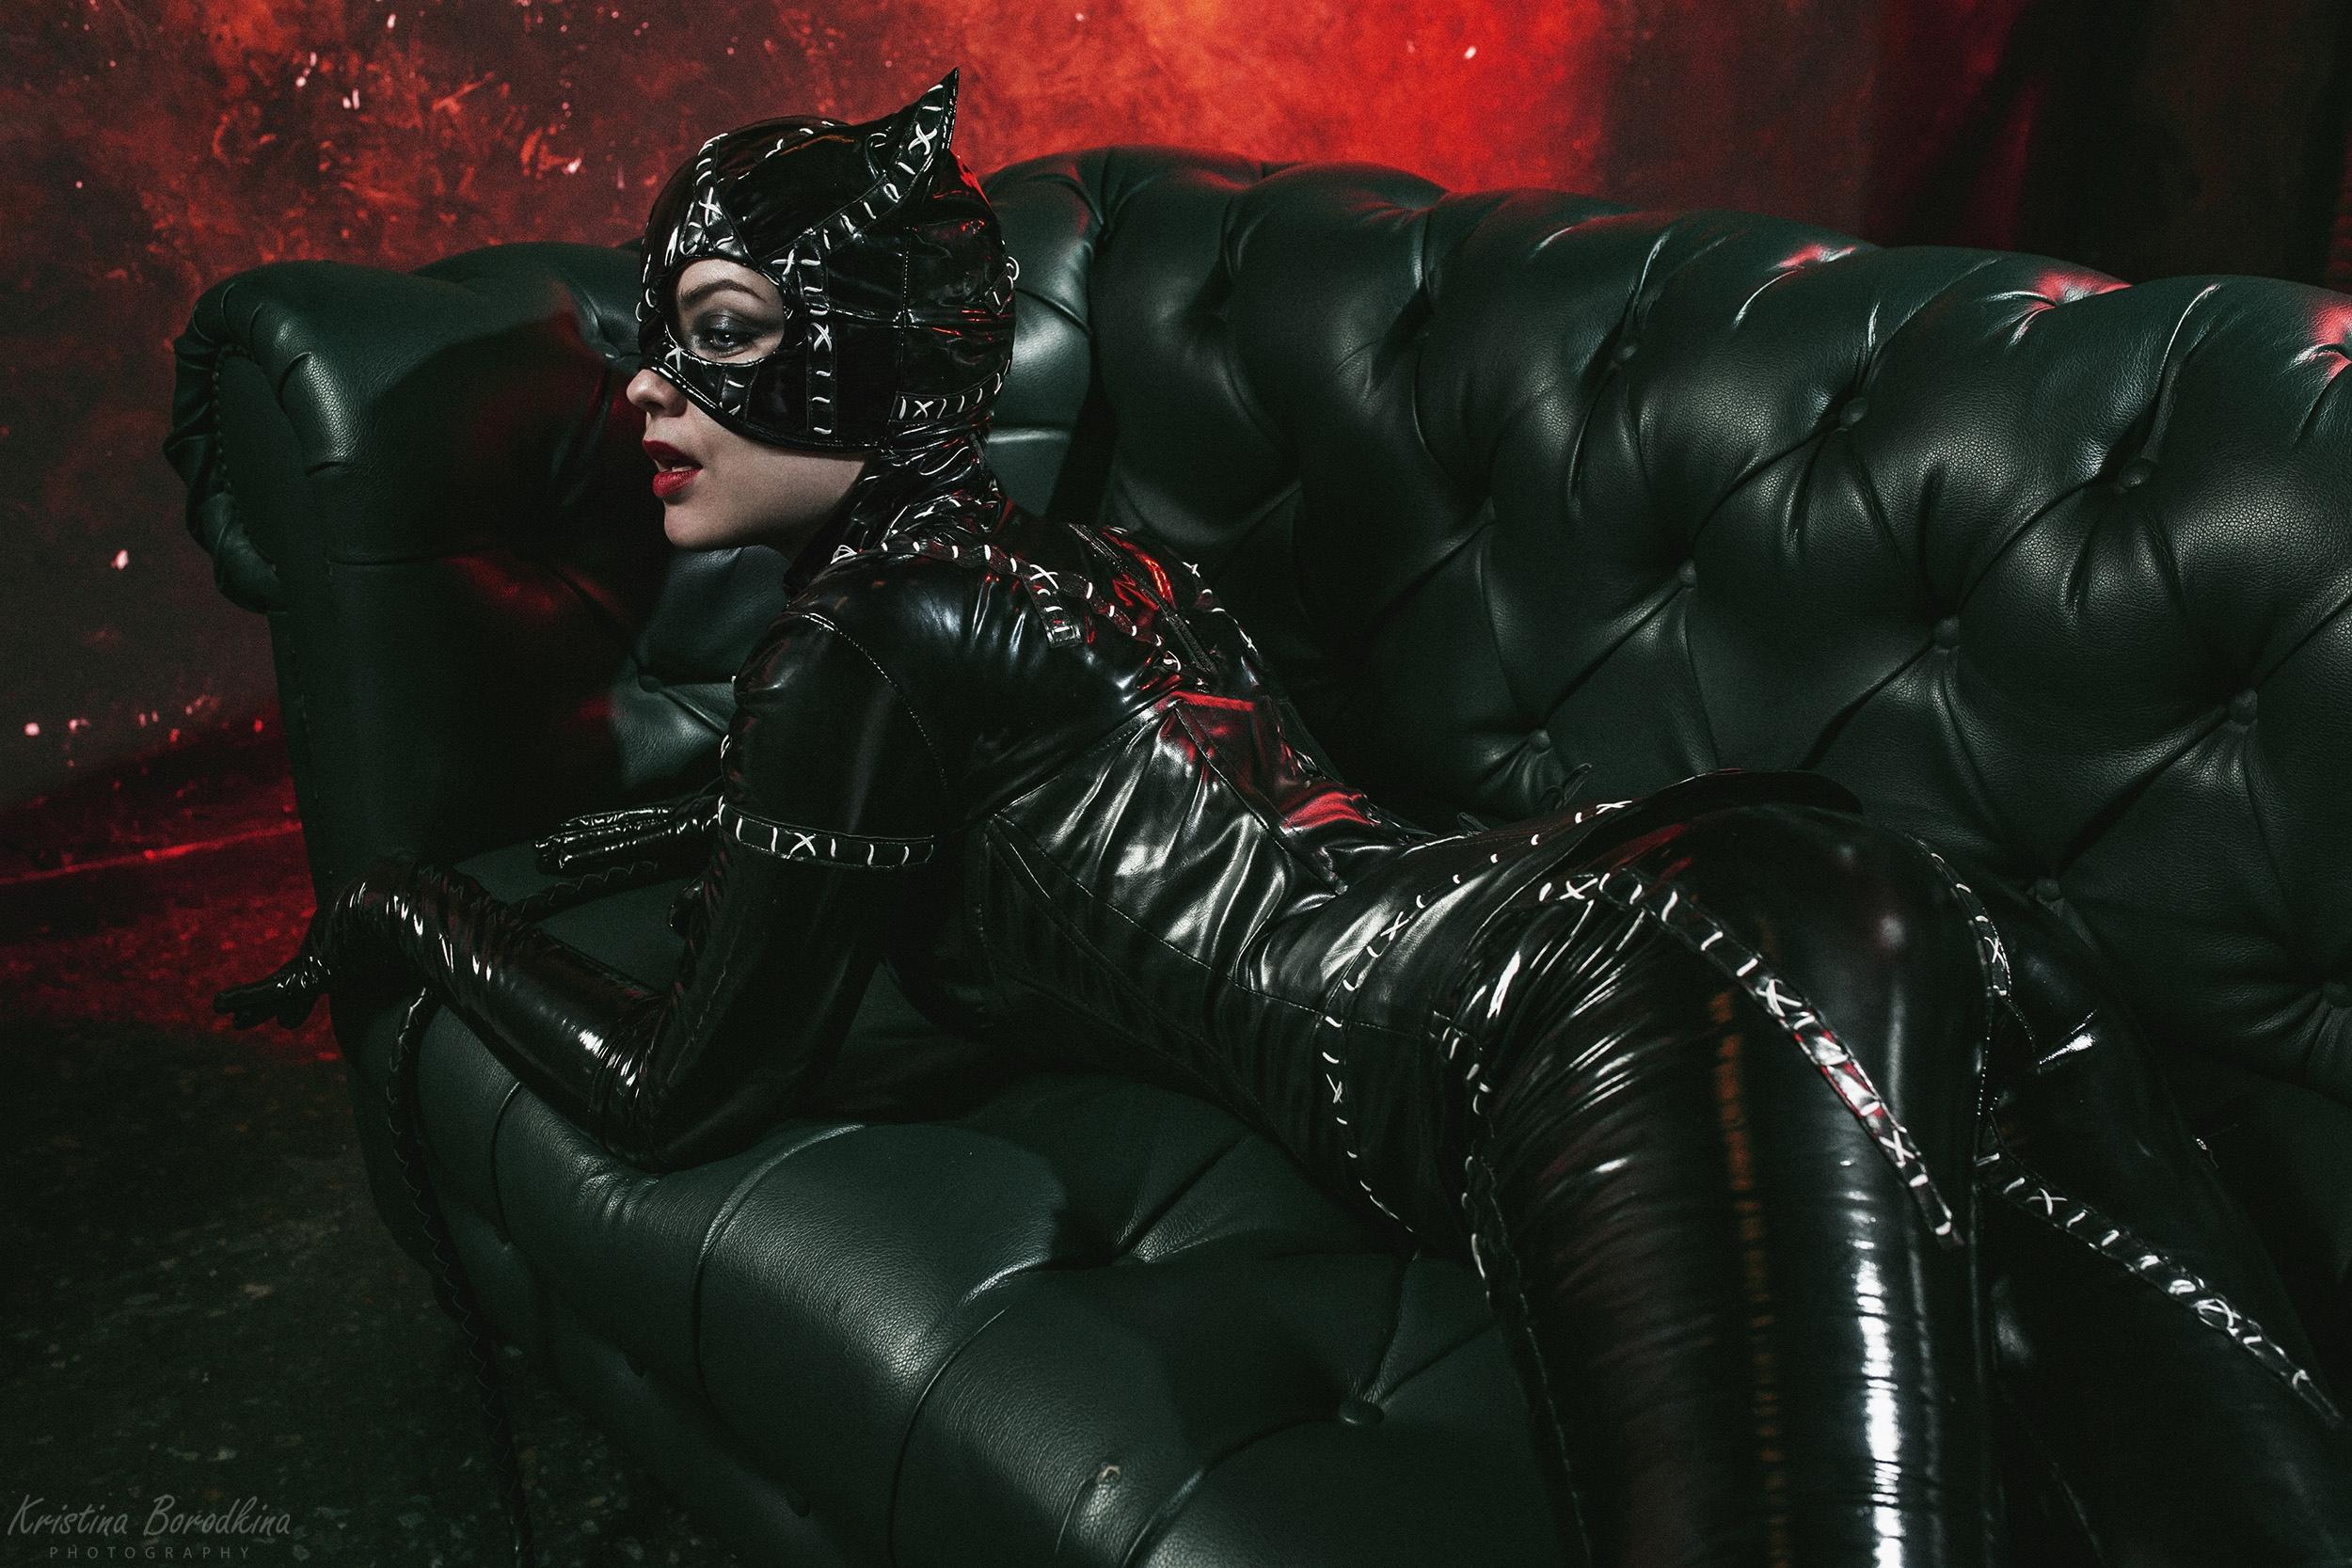 People 2500x1667 Catwoman cosplay latex latex bodysuit black latex mask face mask dark women photography costumes women indoors indoors lipstick red lipstick cat girl Kristina Borodkina